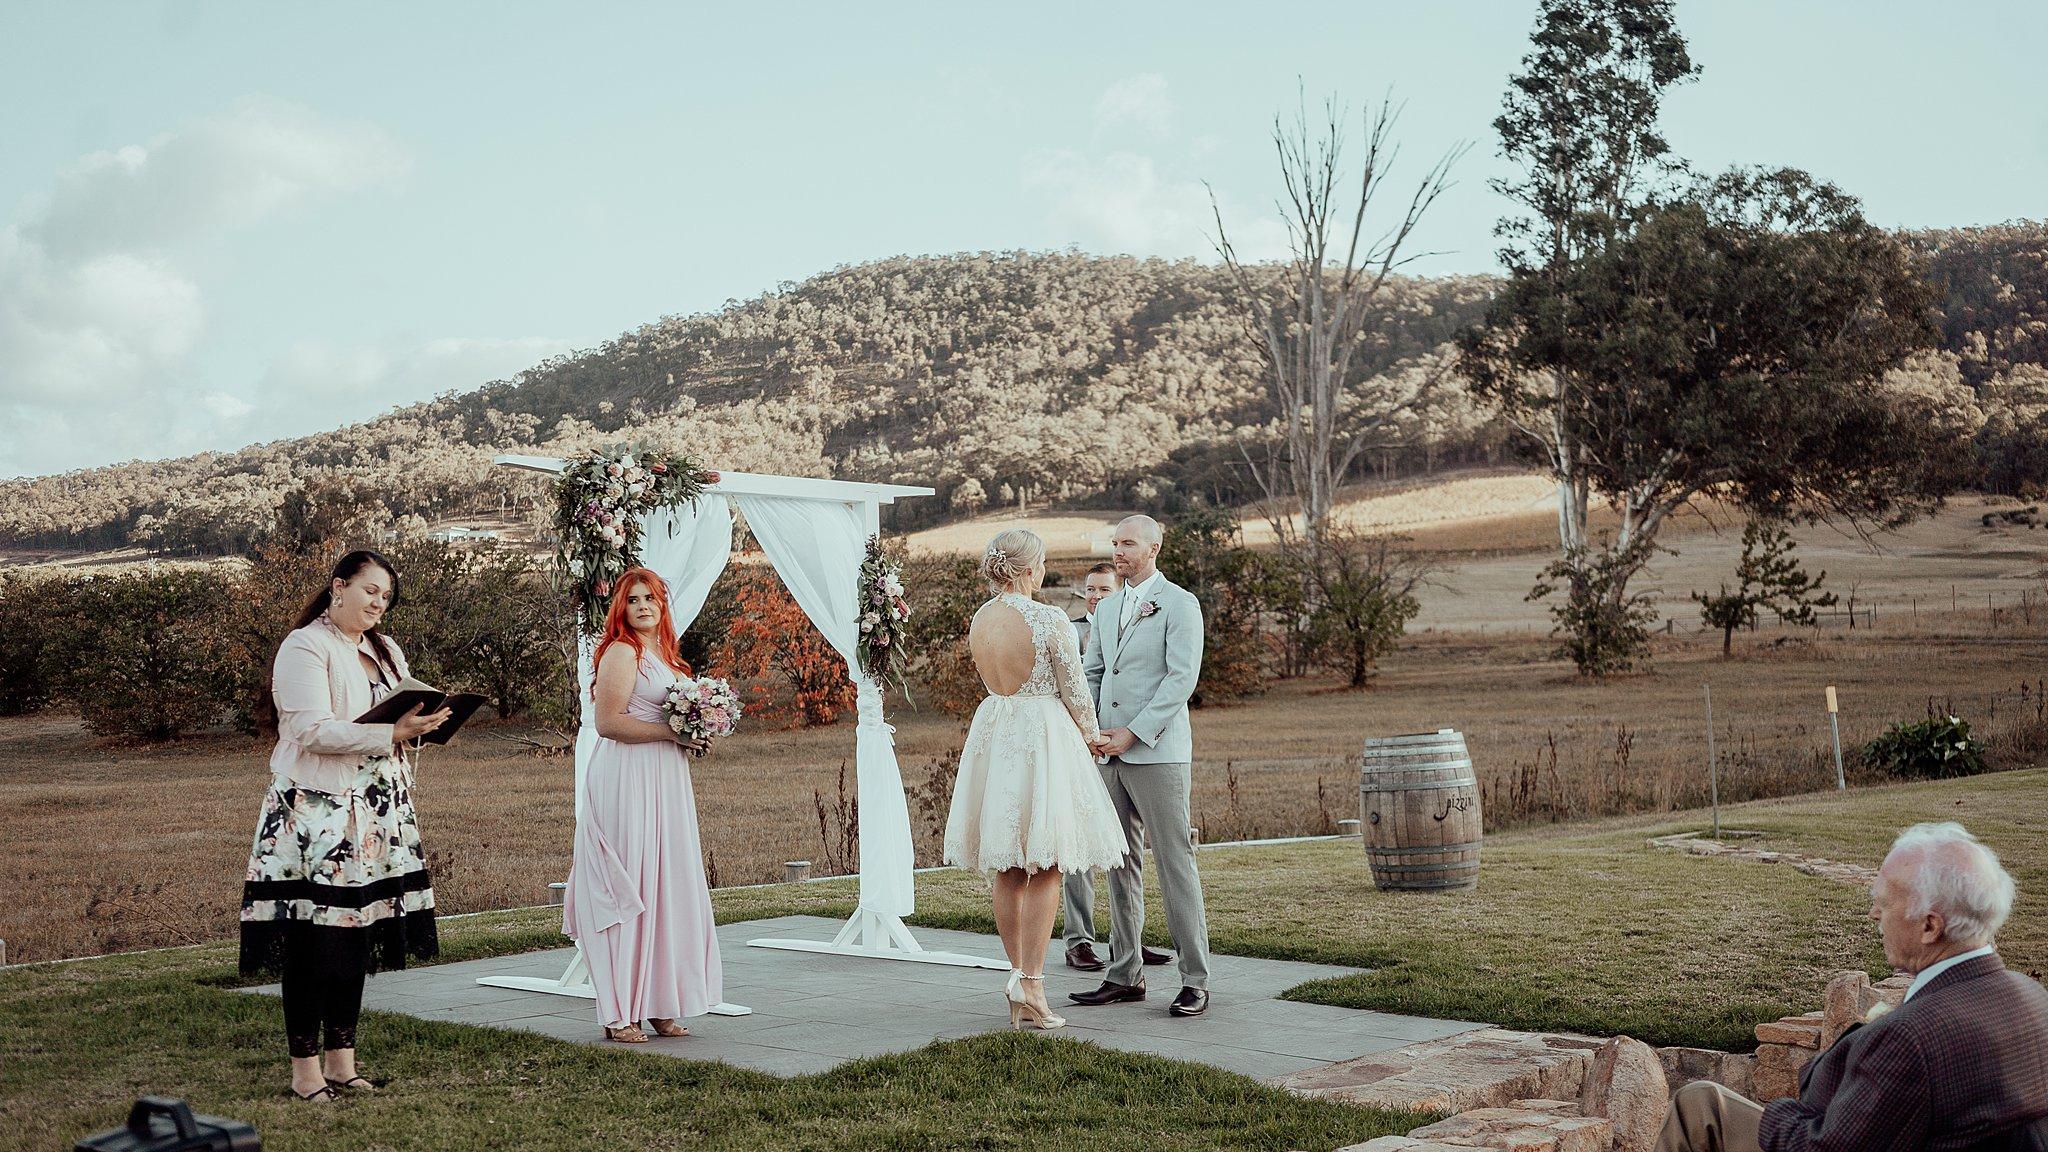 mickalathomas_puremacphotography_weddingphotographer_couplephotographer_Sheppartonphotographer_3431.jpg